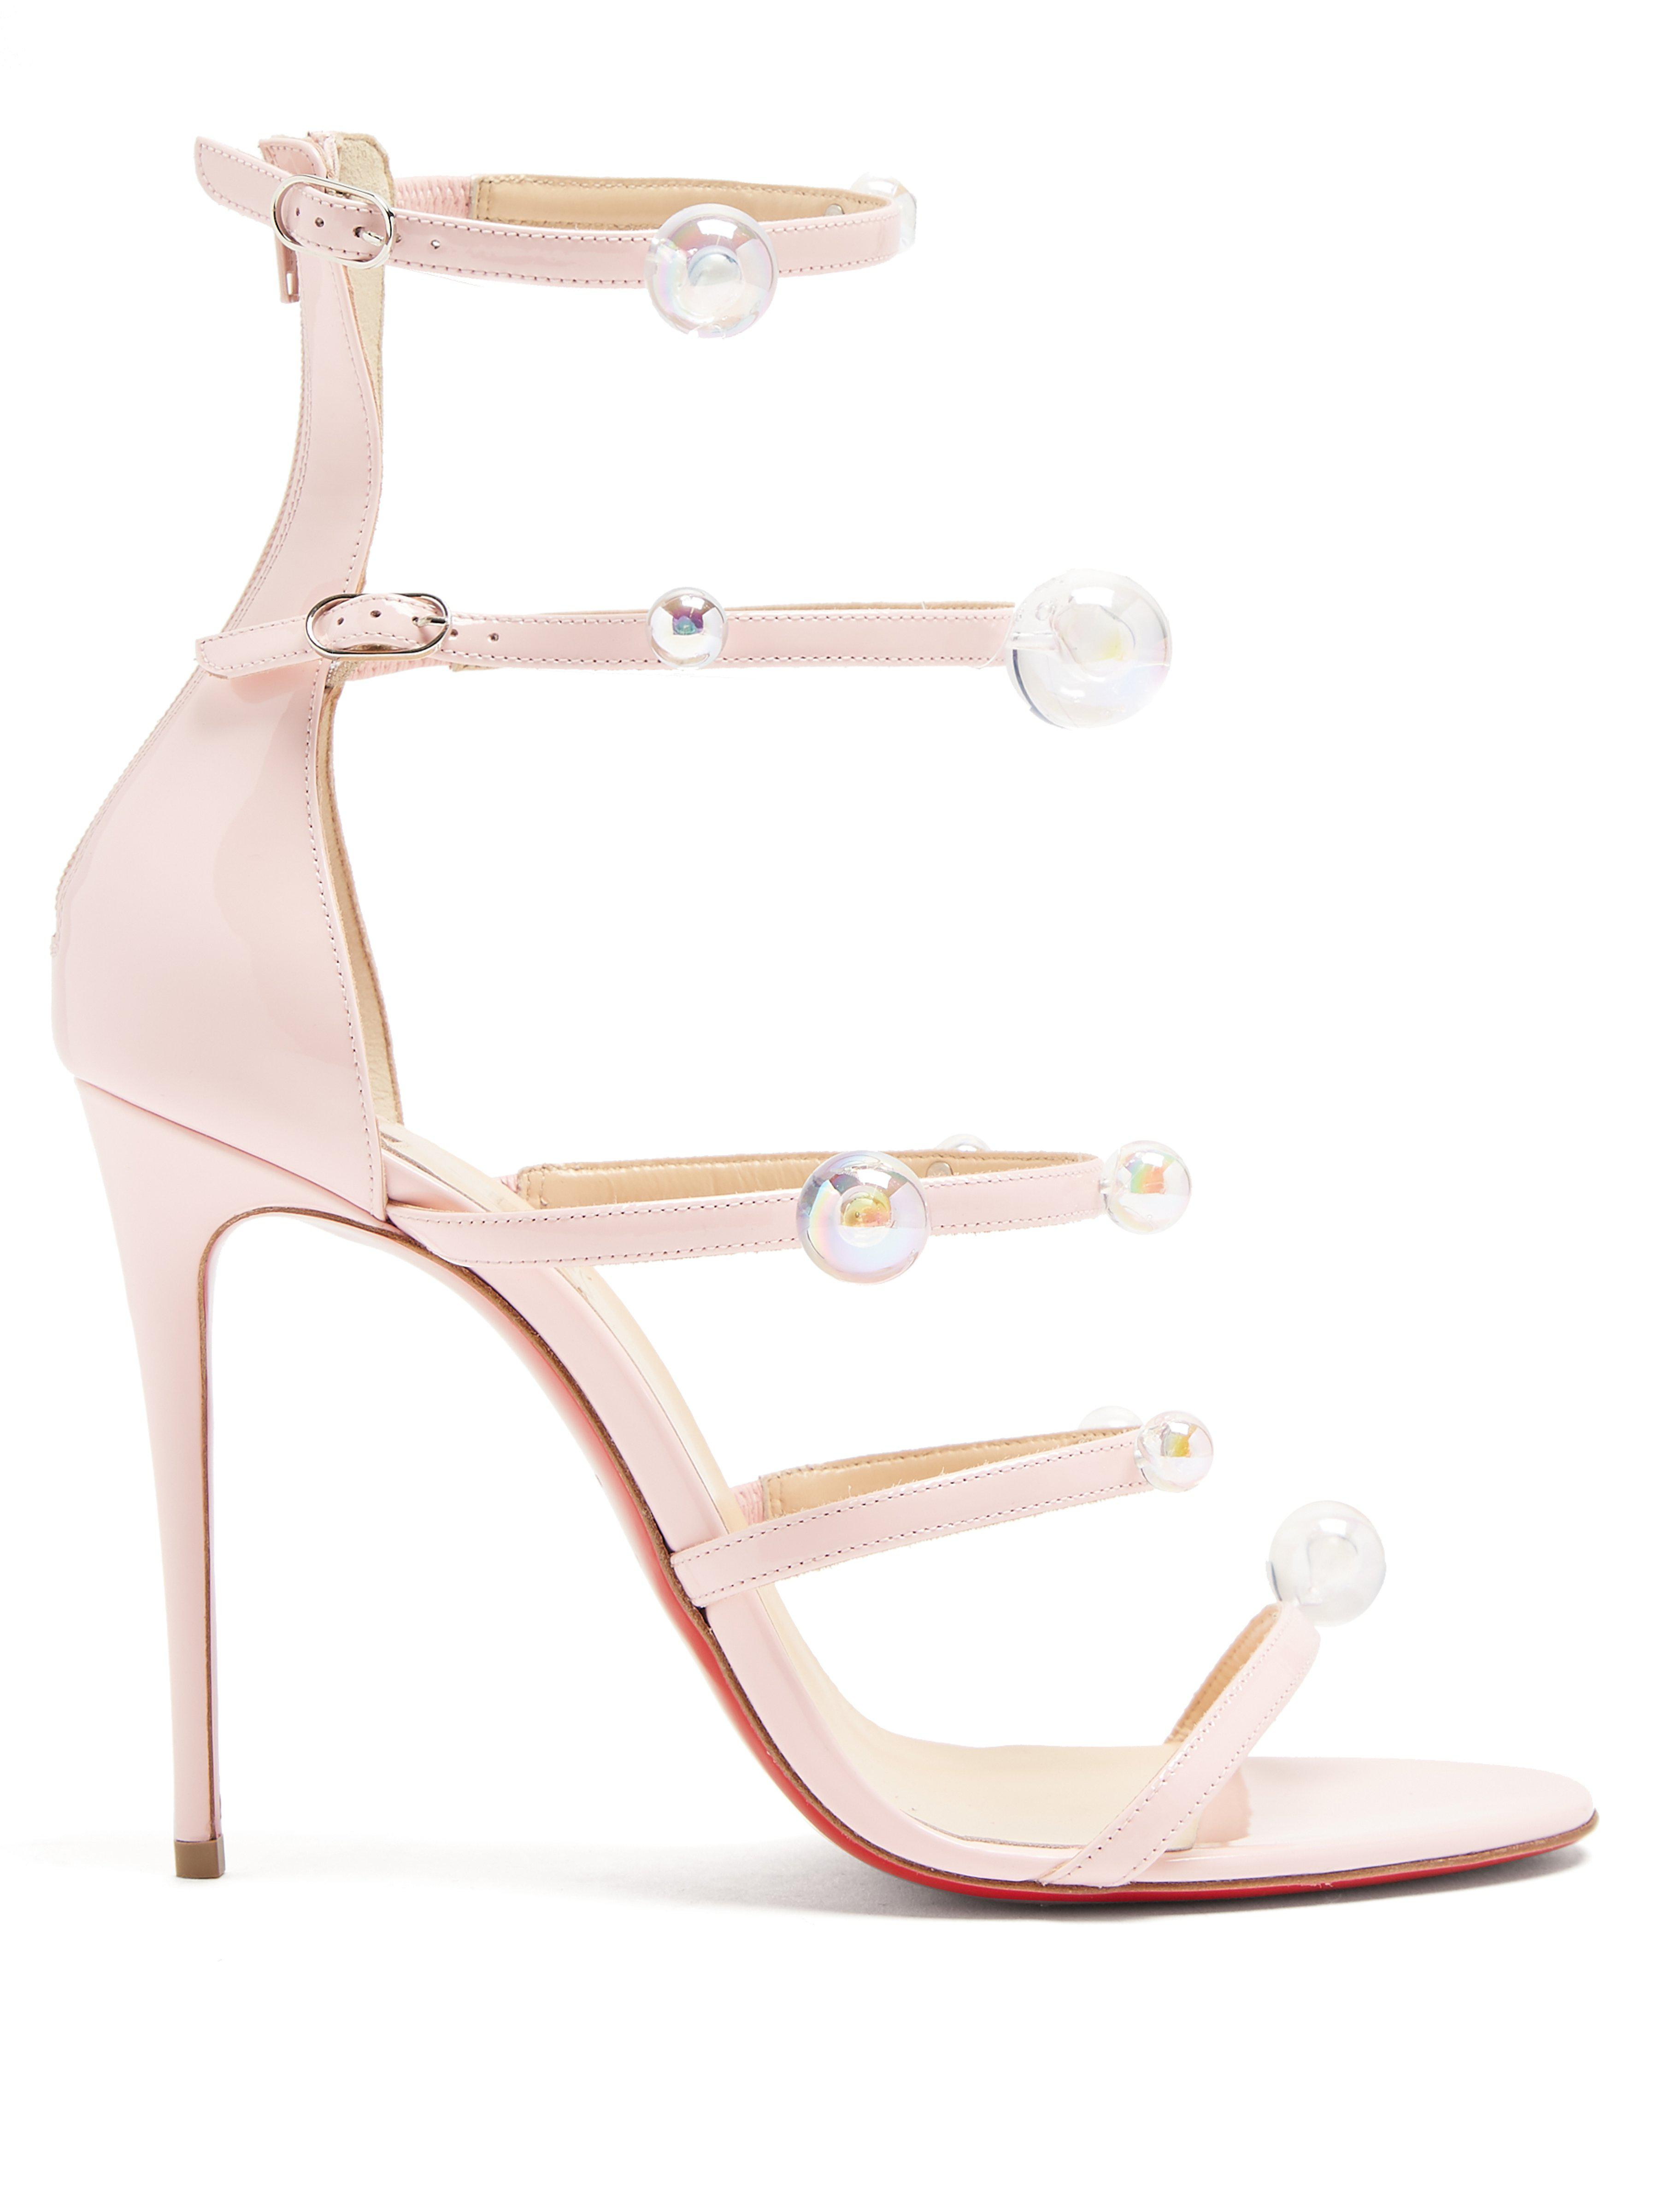 fd7f7894a christian-louboutin-pink-multi-Antonana-100-Patent-Leather-Sandals.jpeg